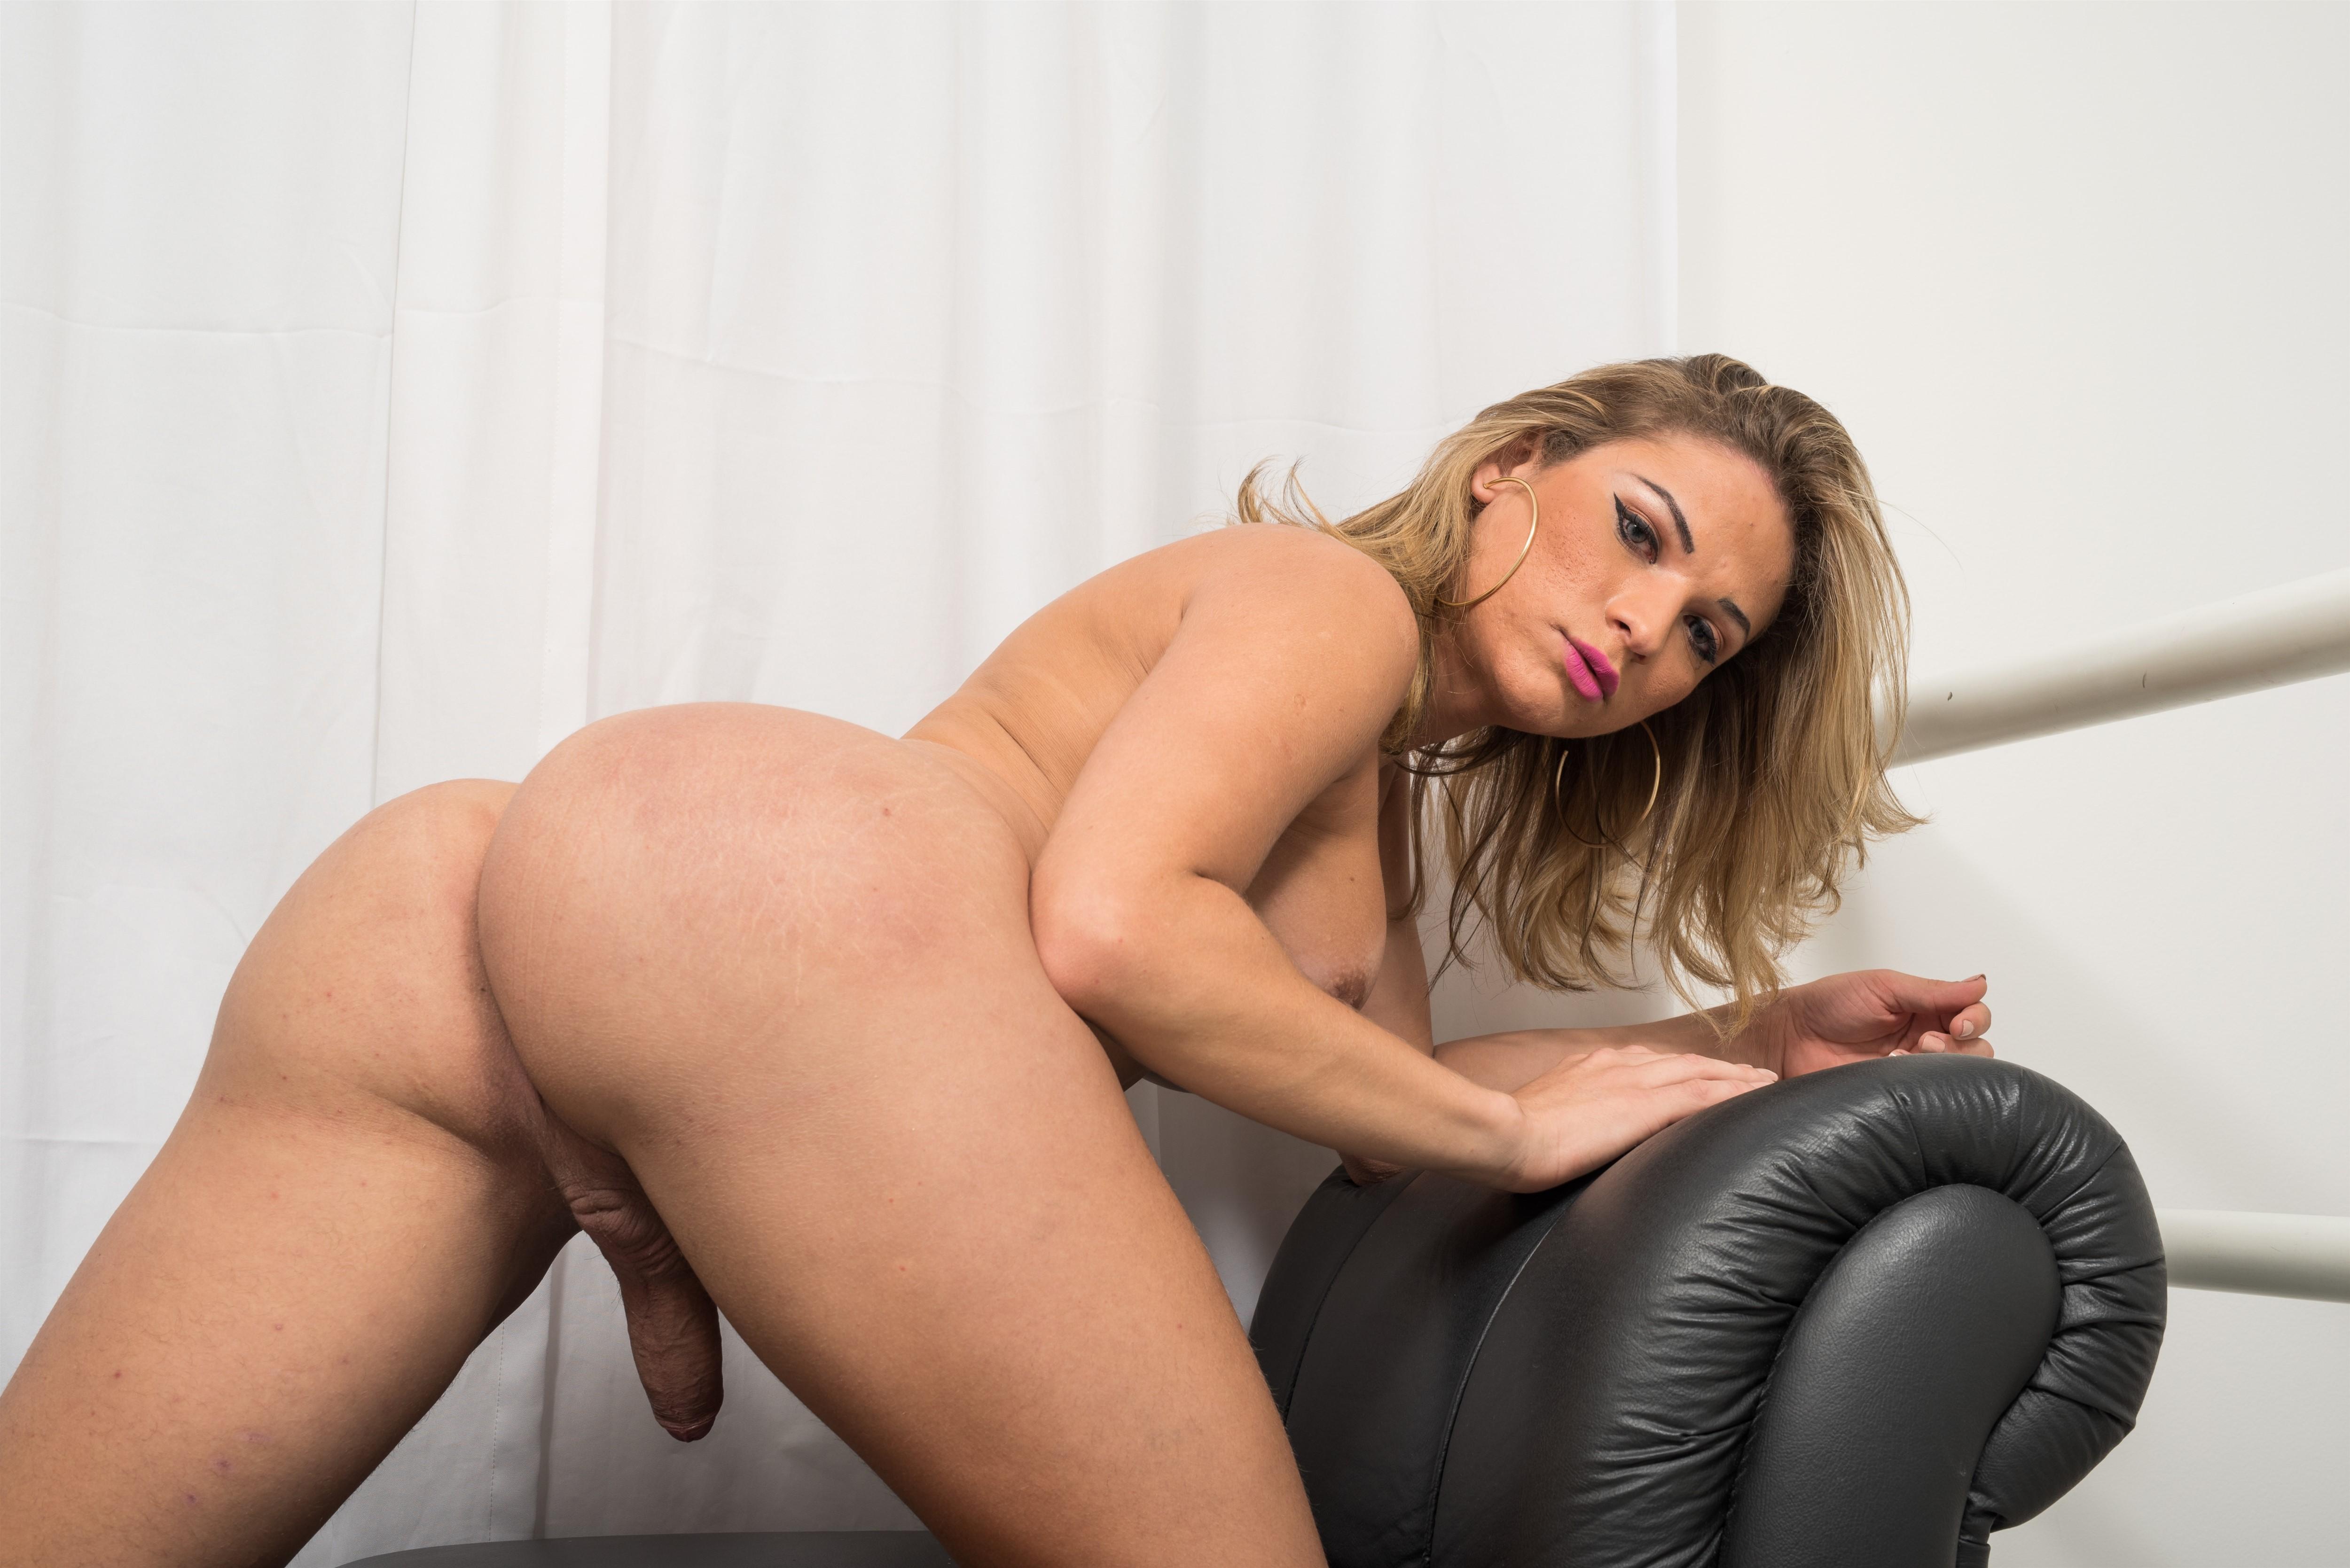 Luana alves doggystyle free porn images